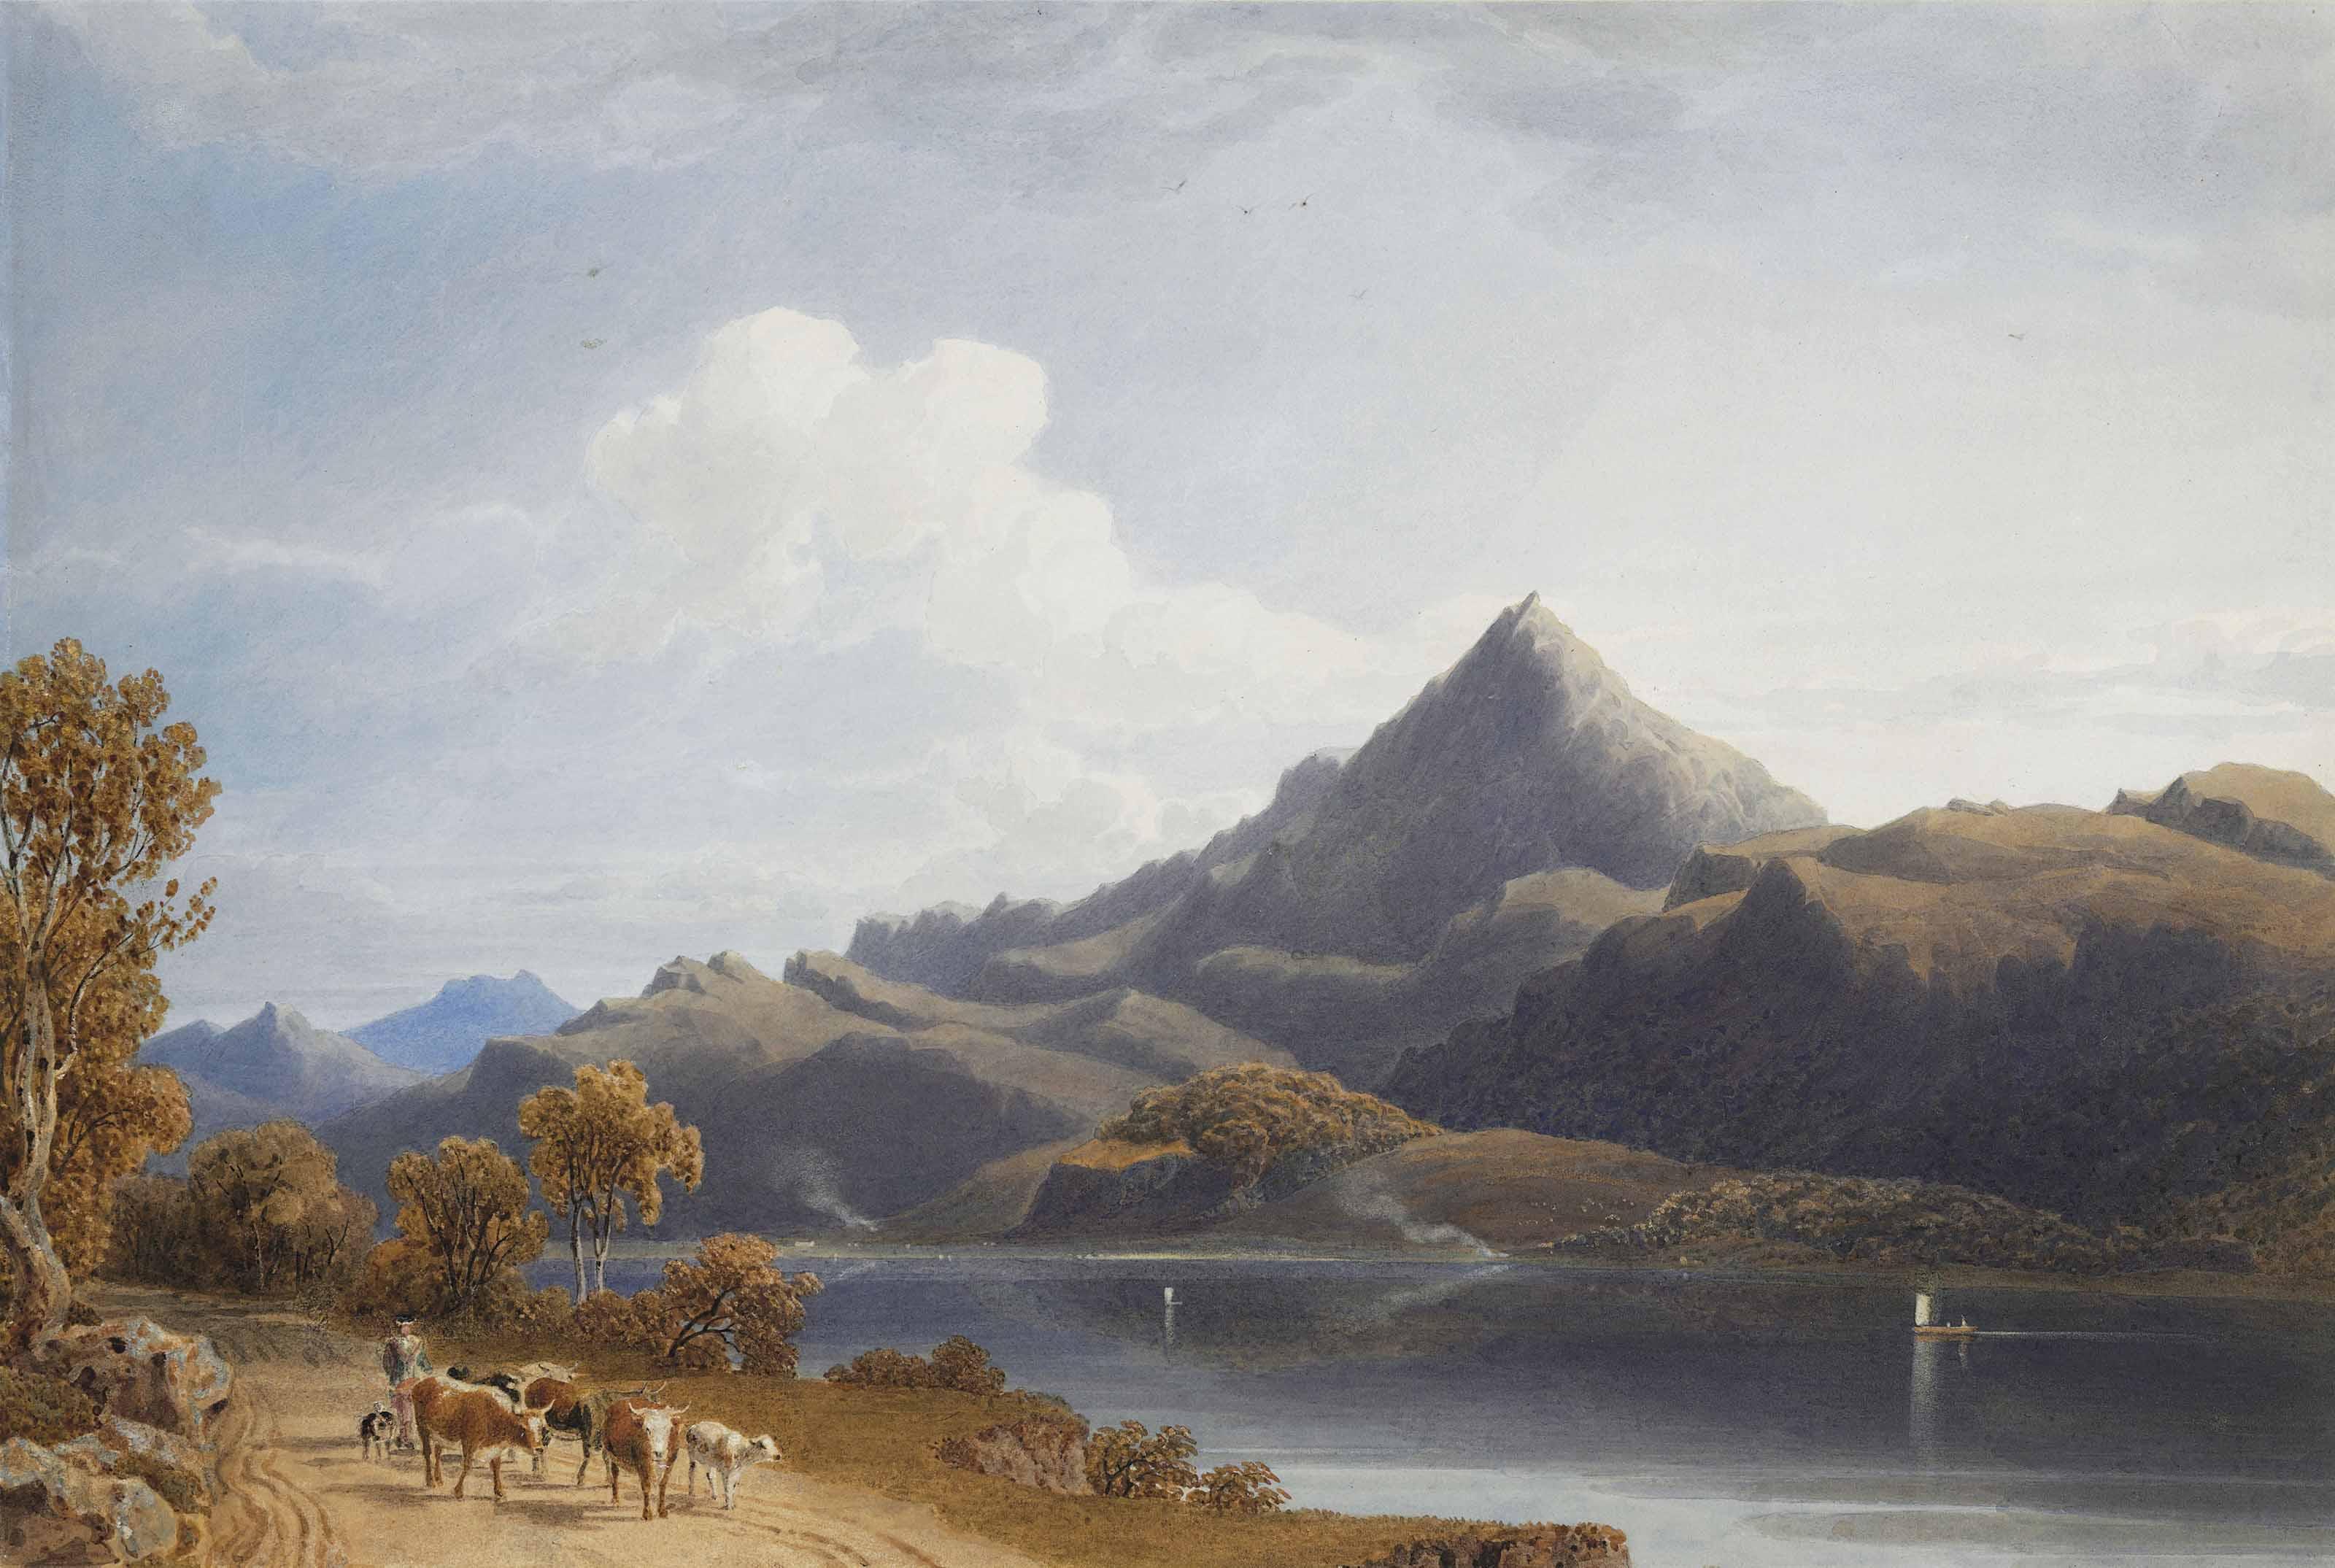 A cattle drover on the north shore of Loch Rannoch, Schiehallion behind